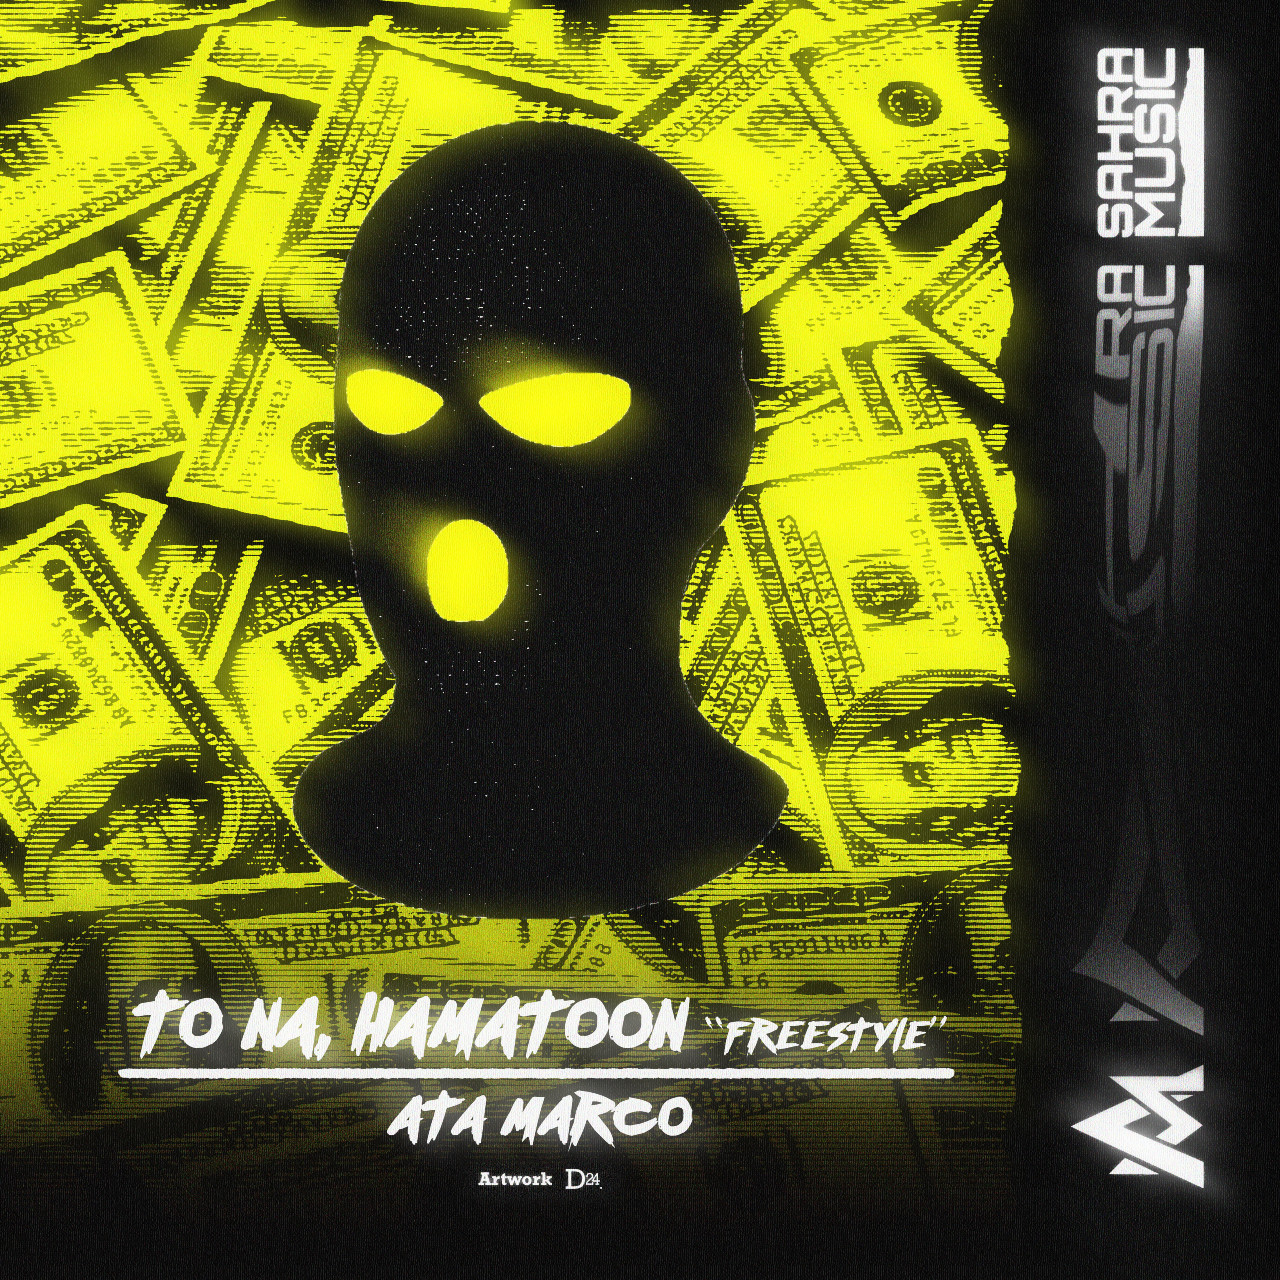 Ata Marco - To Na Hamatoon